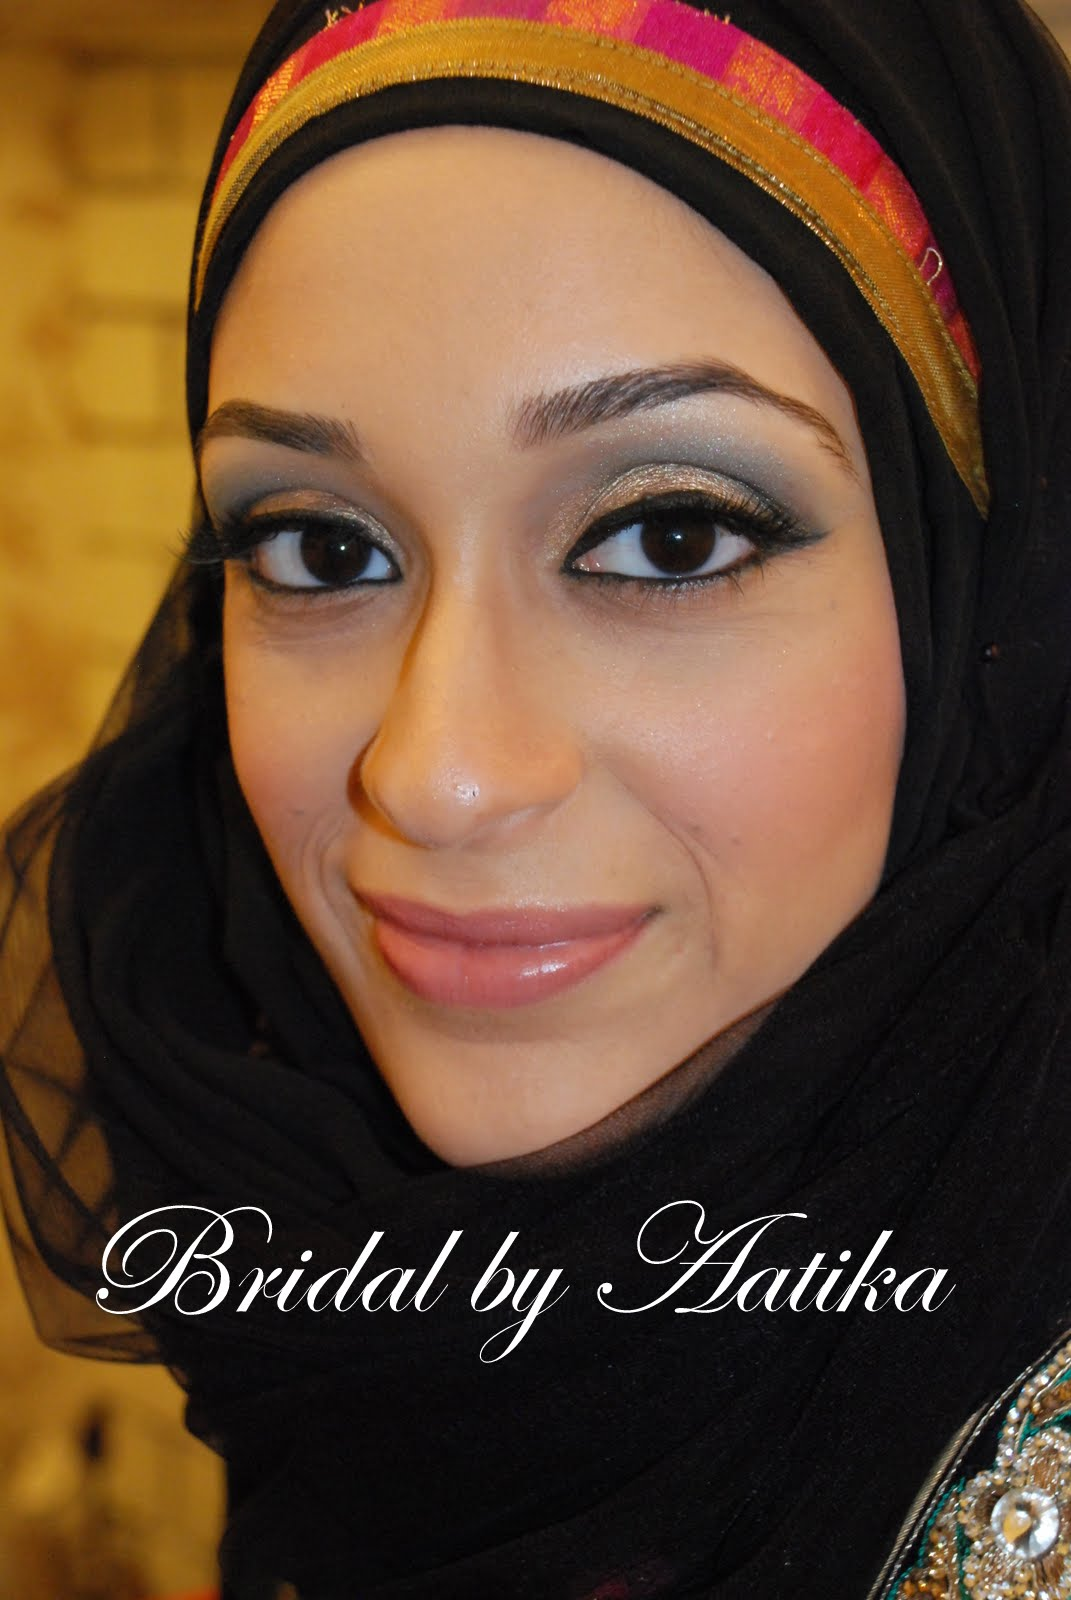 Lihatlah betapa cantiknya dia terlihat dalam gaya sederhana ini. Wajah oval  cocok semua gaya hijab dan ... 8079cef12a